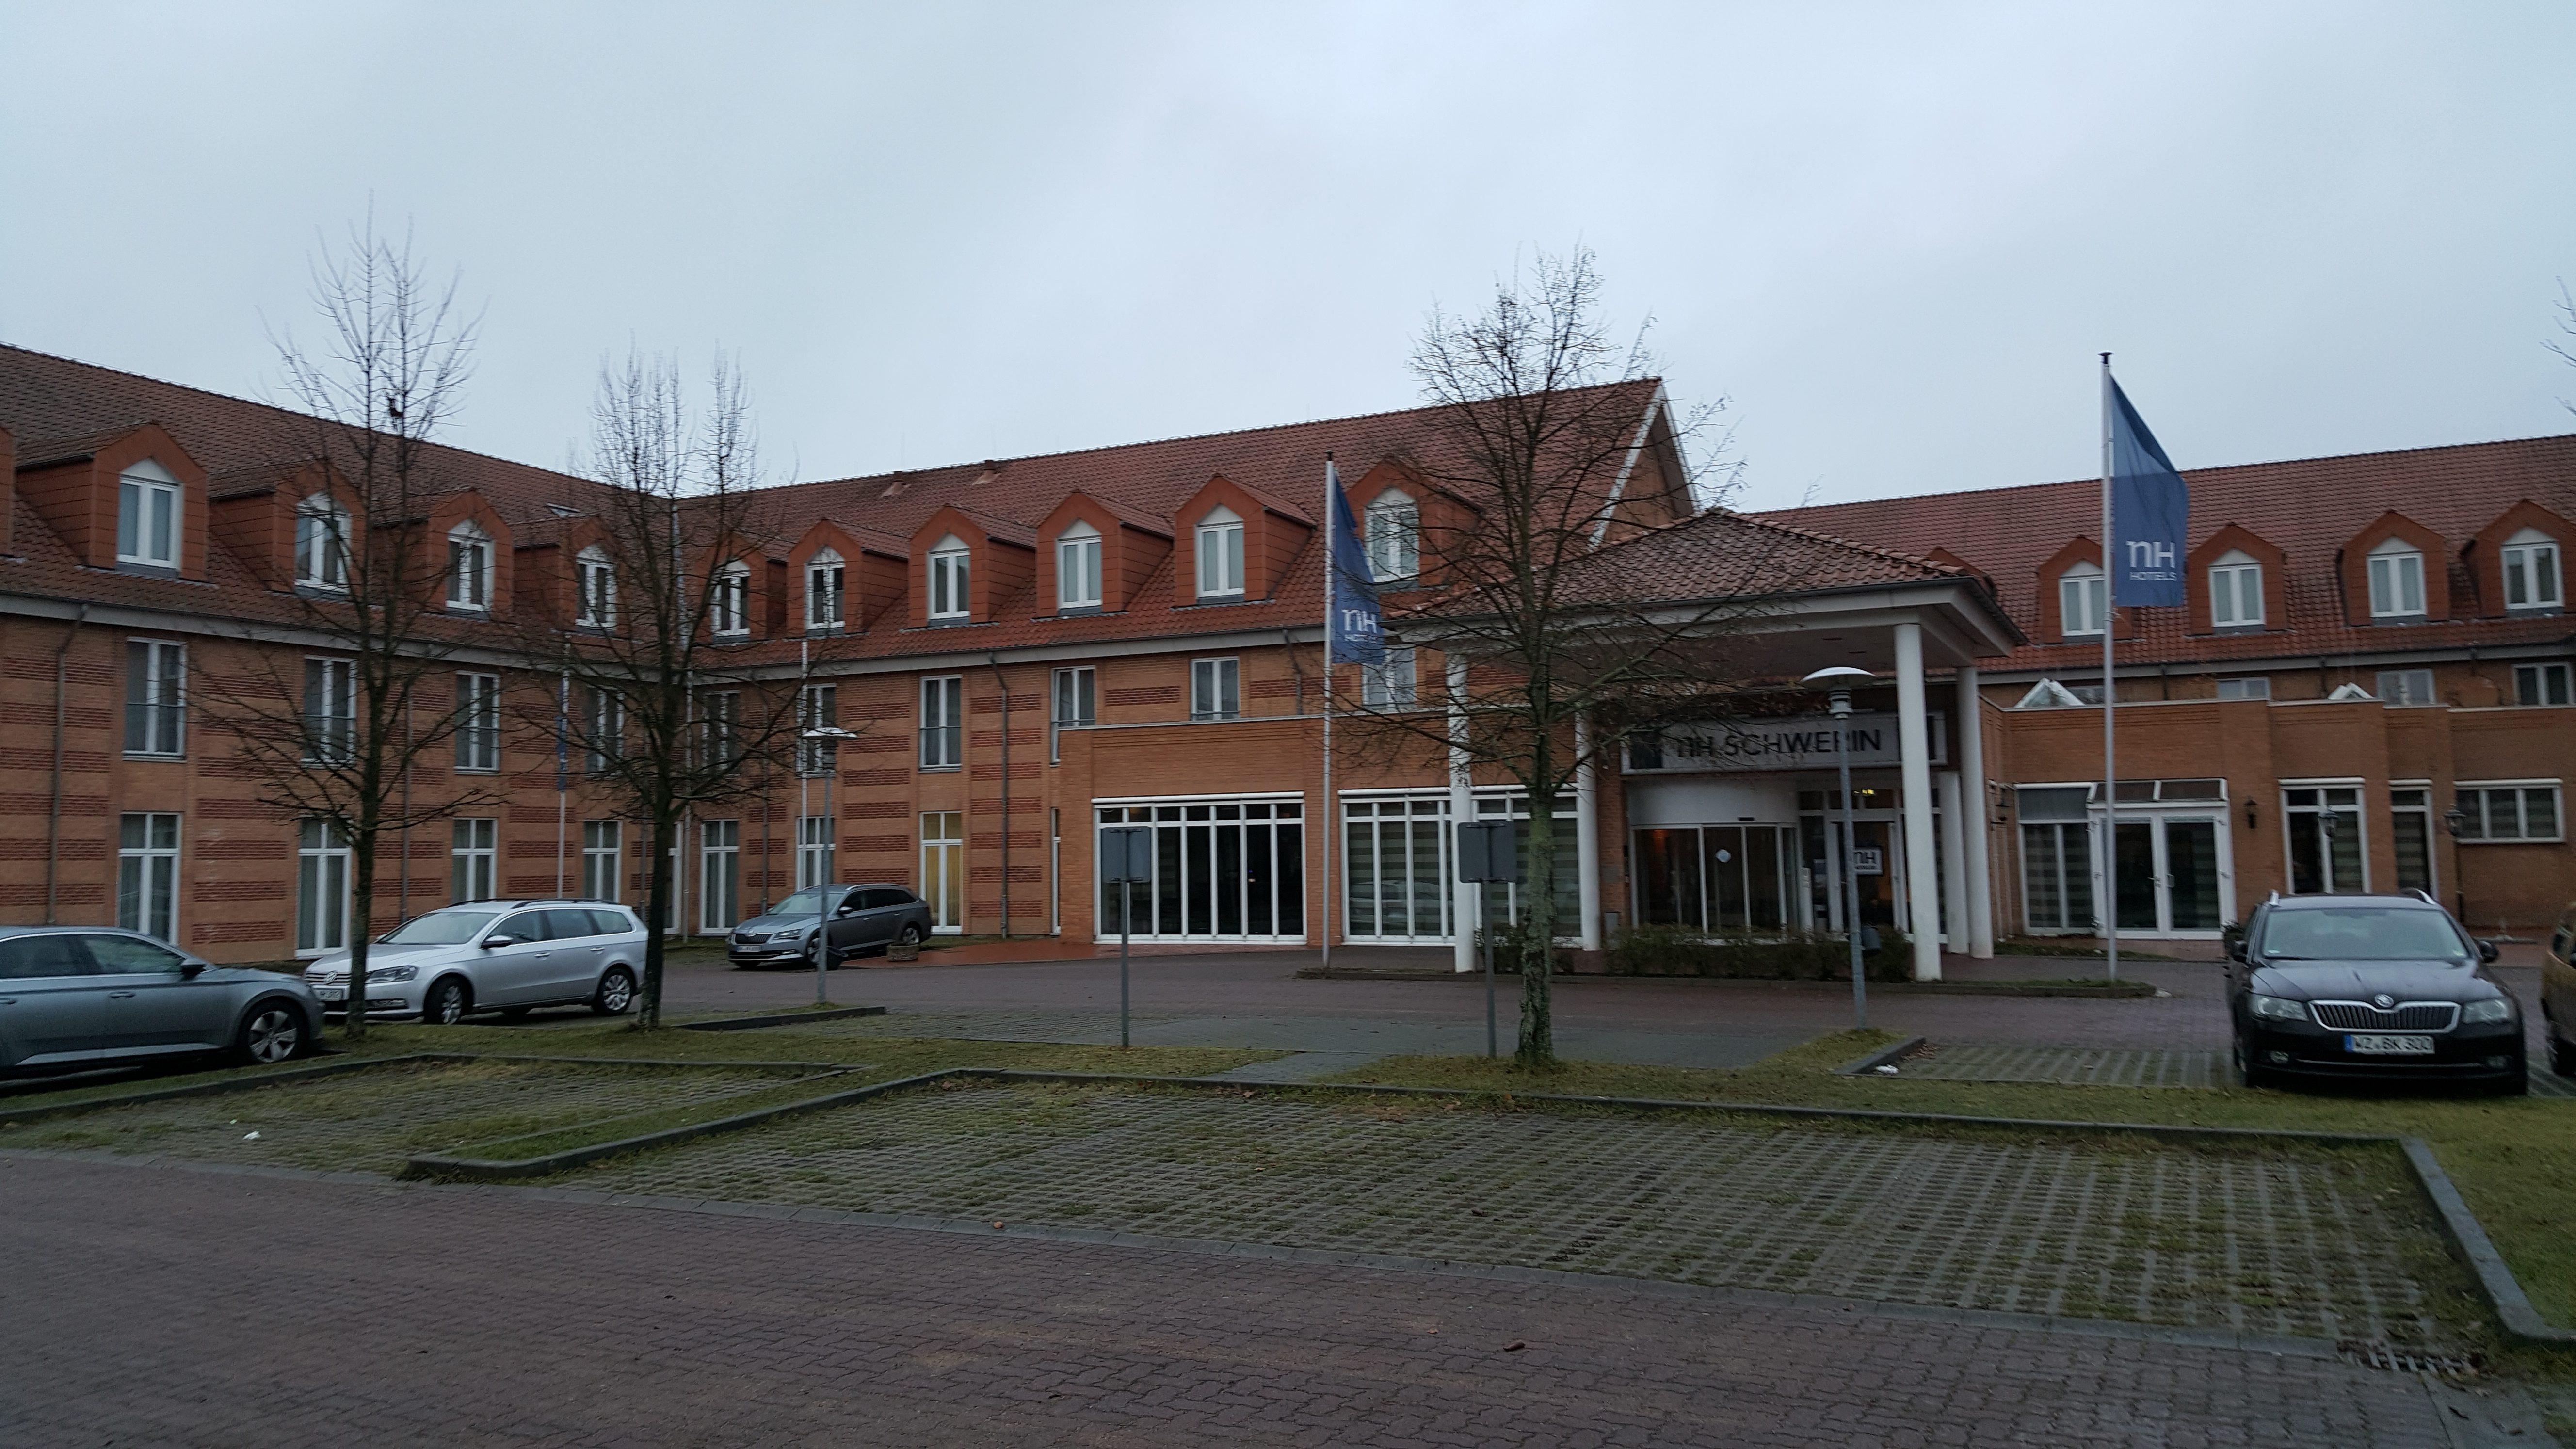 NA Hotel Schwerin